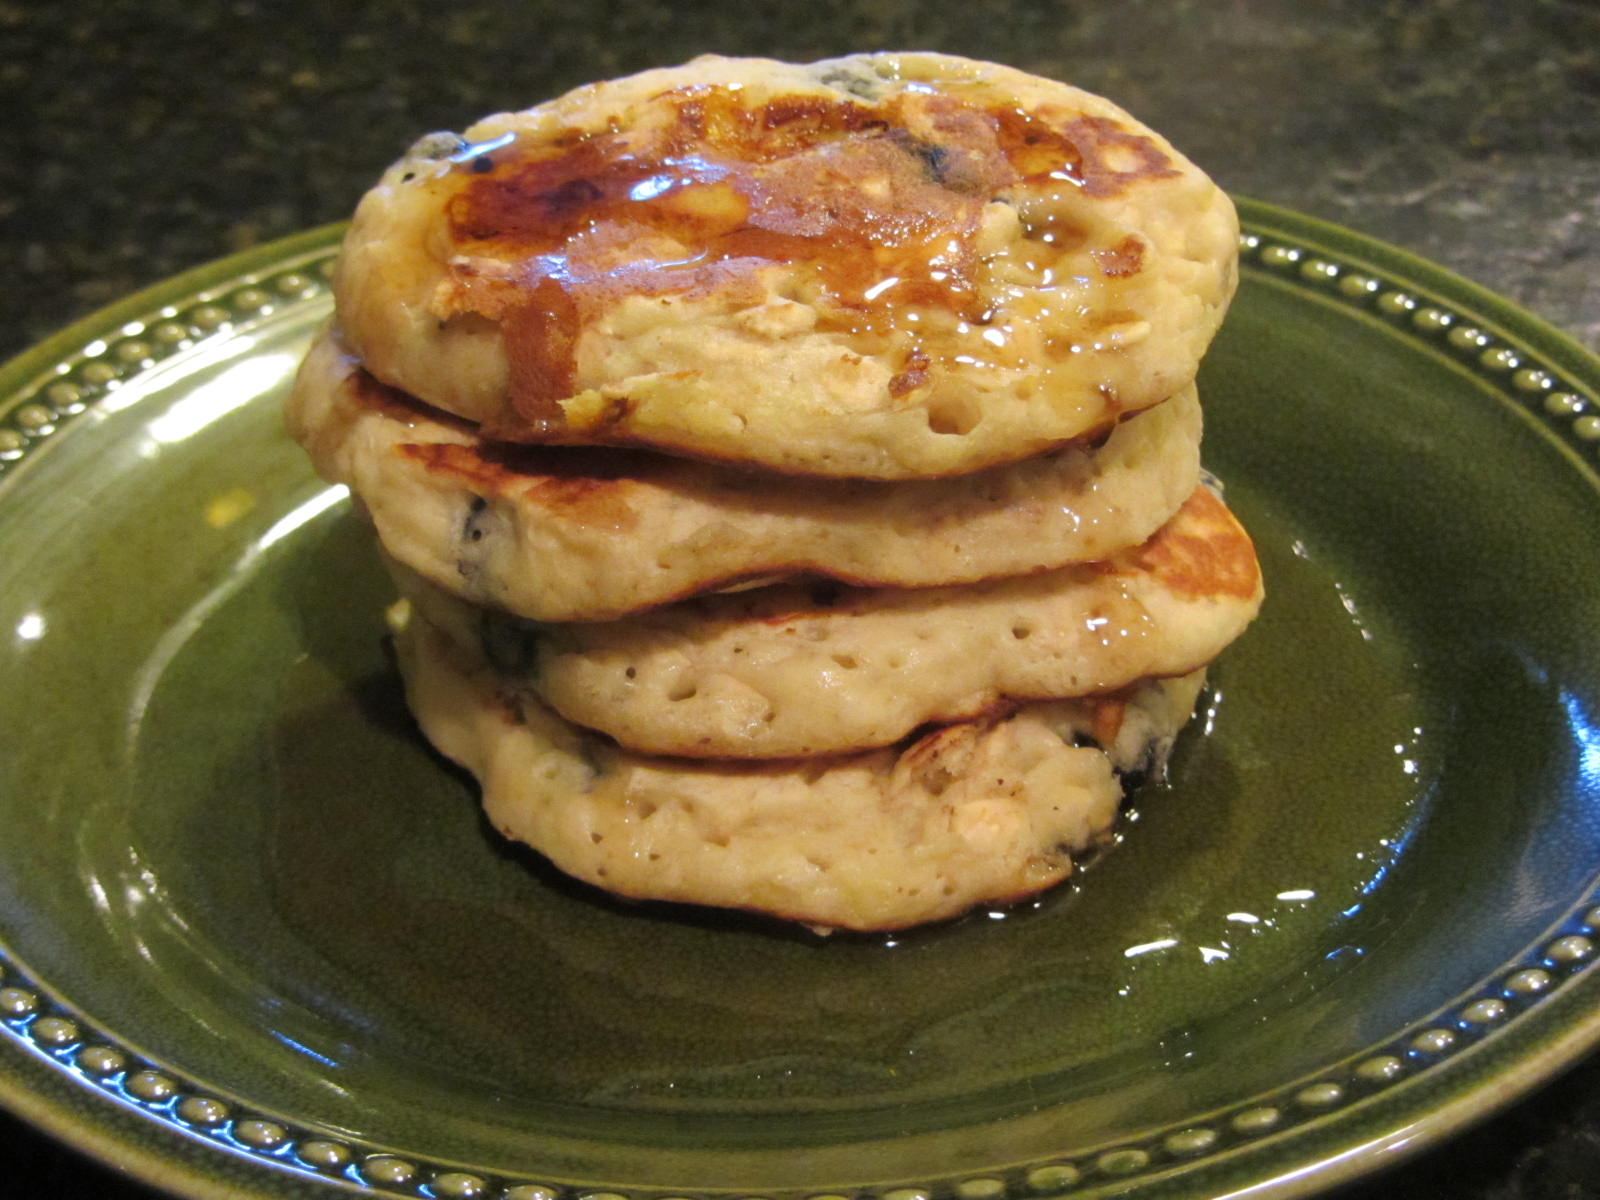 Must-Try Breakfast Recipe: Banana Blueberry Pancakes